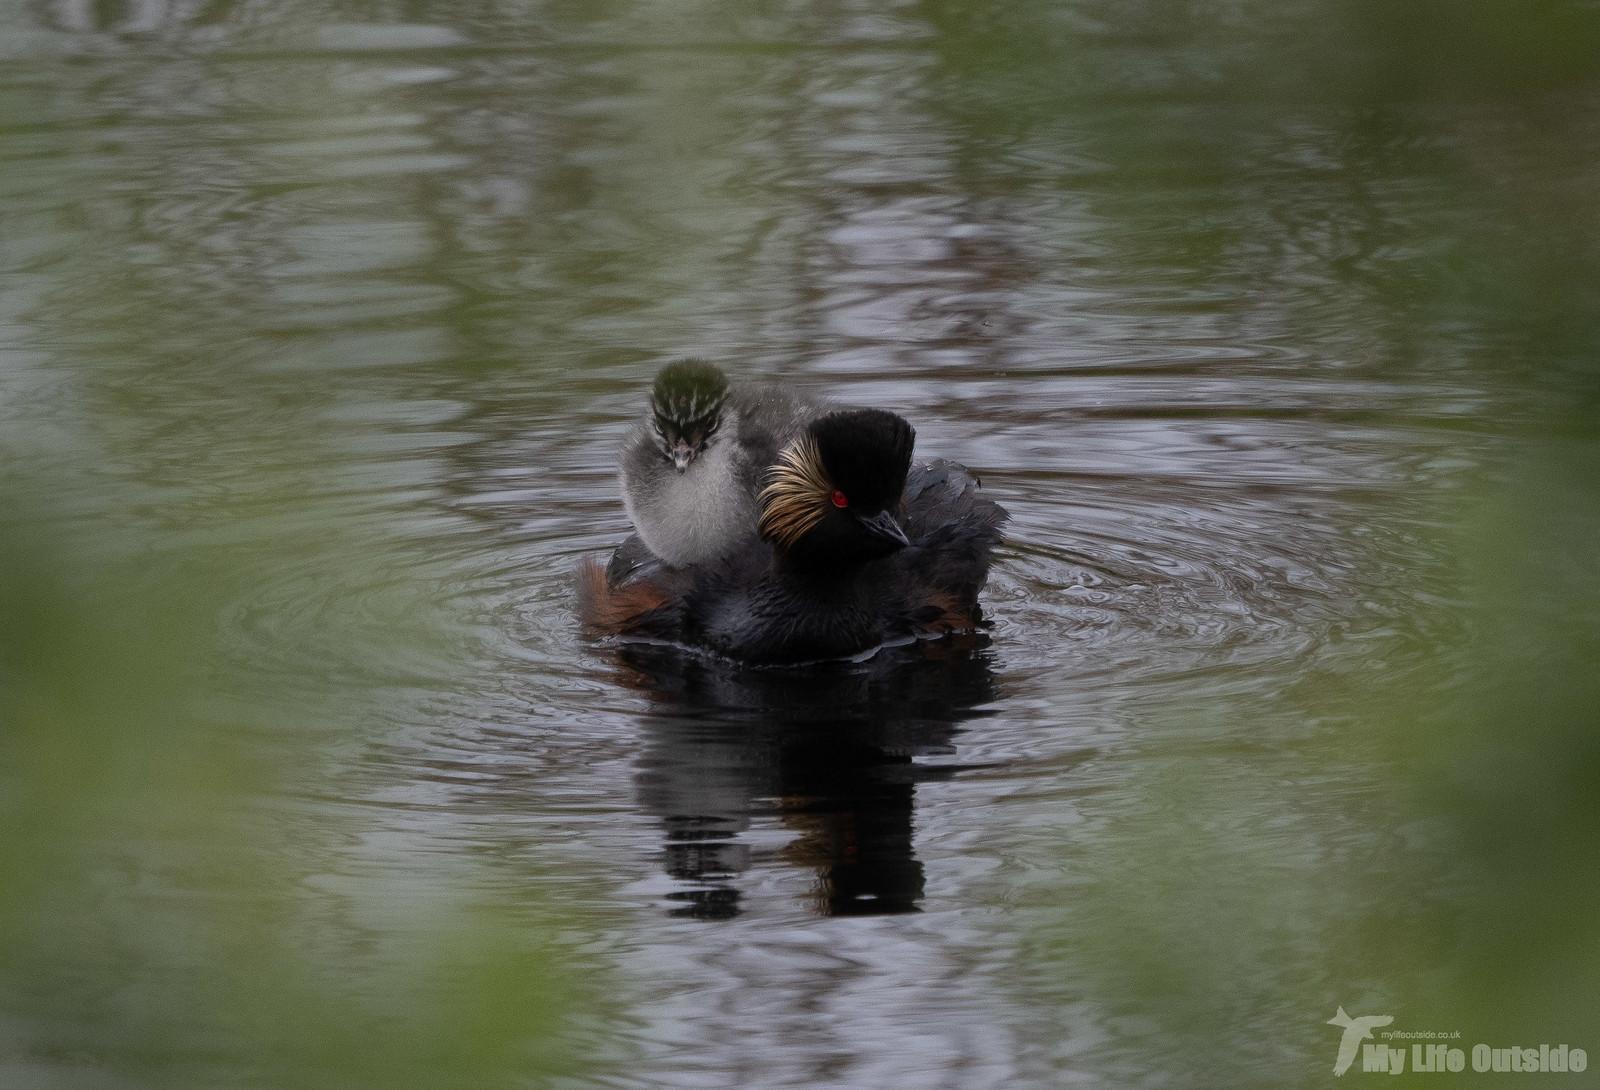 P5142102 - Black-necked Grebe, St Aidan's